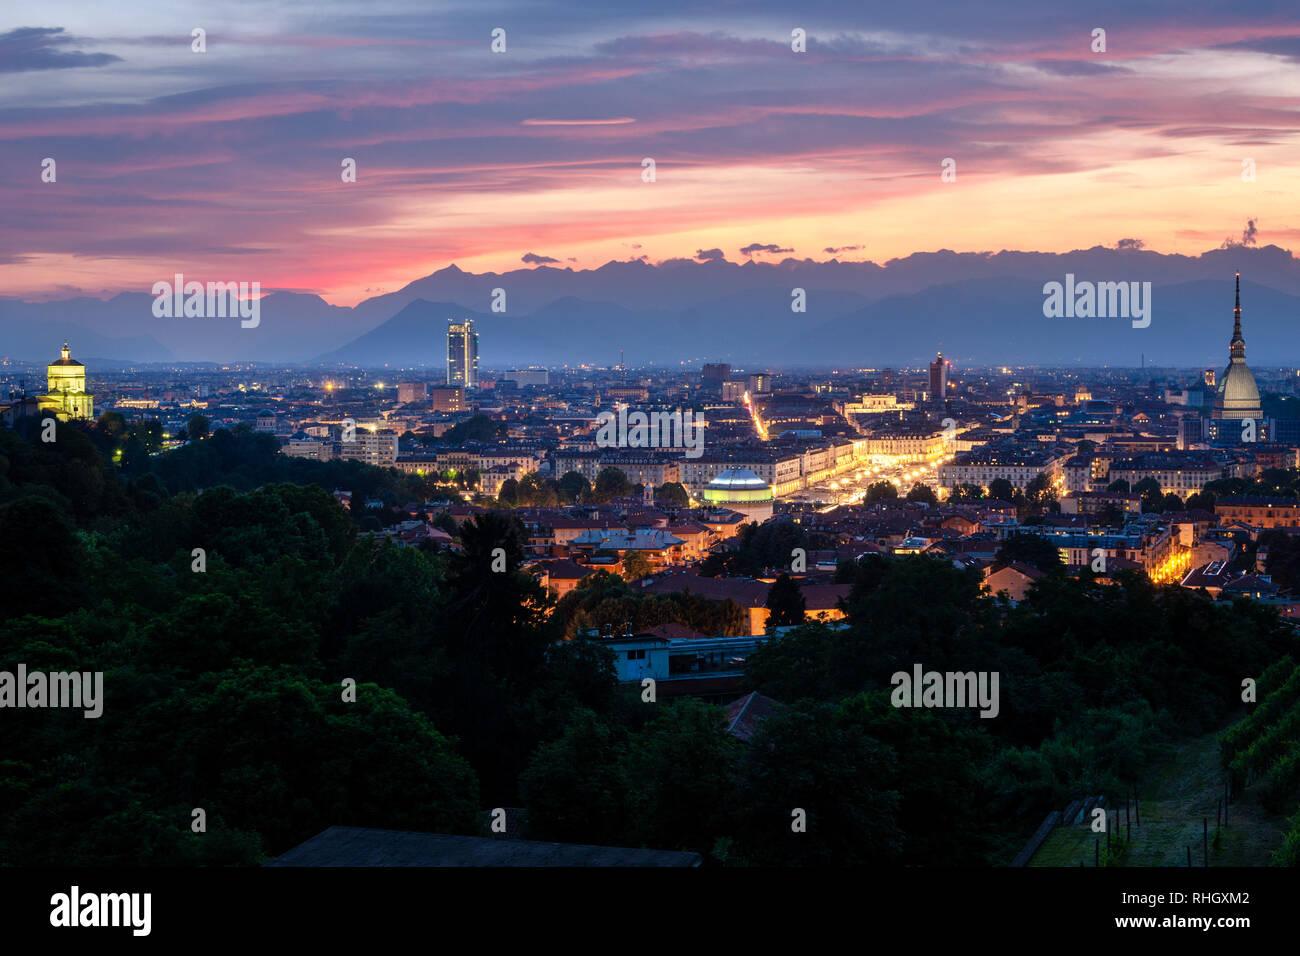 Turín sunset skyline en alta definición Foto de stock